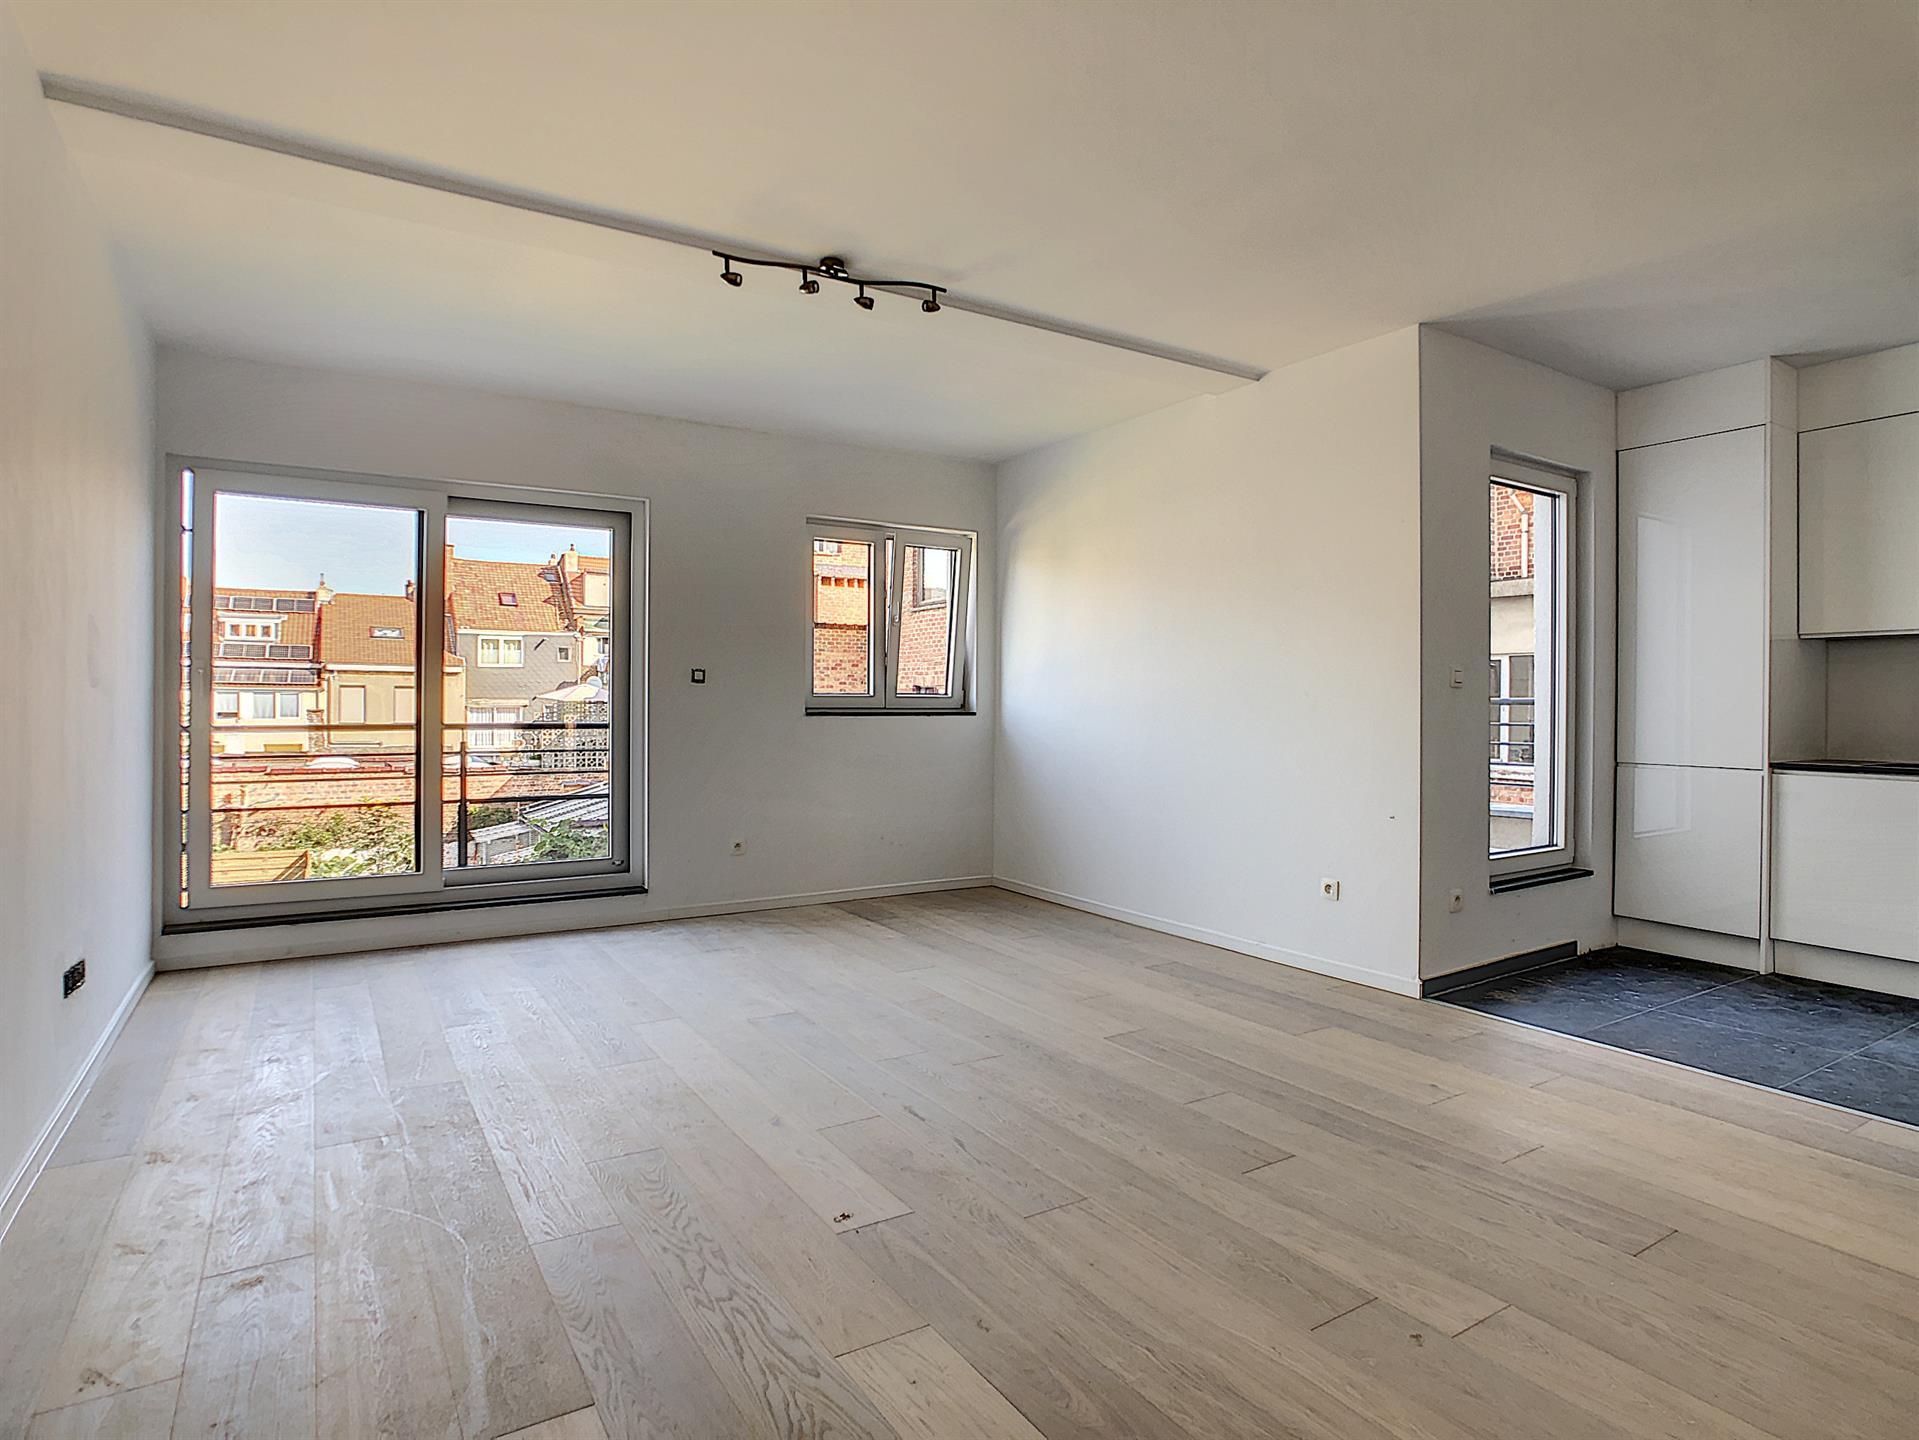 Appartement - Anderlecht - #4252377-4